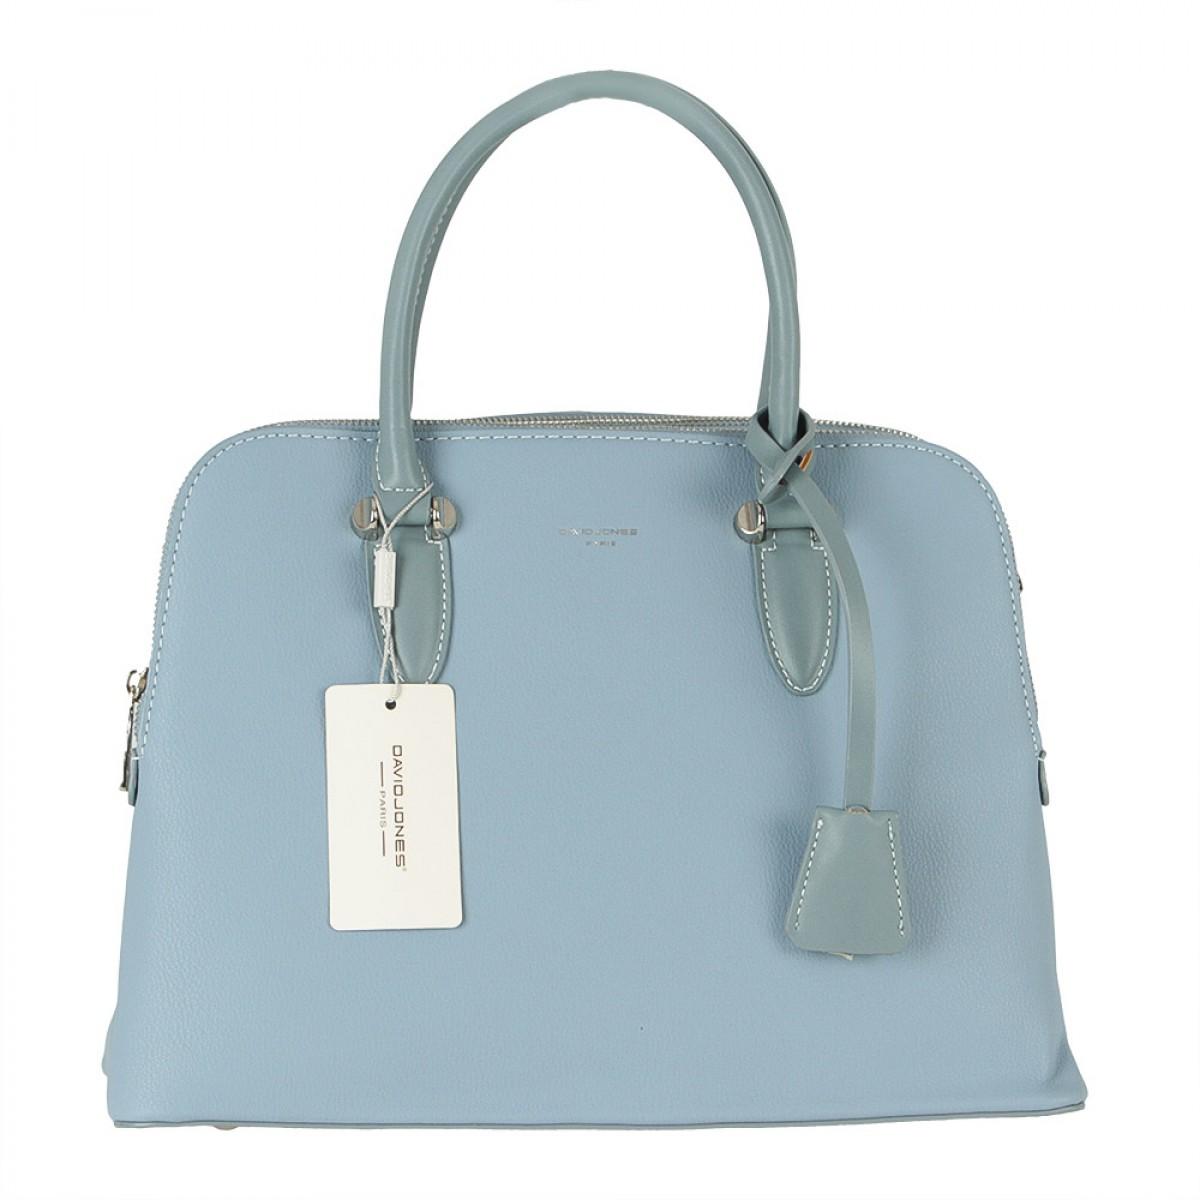 Жіноча сумка David Jones  6207-2A L.BLUE